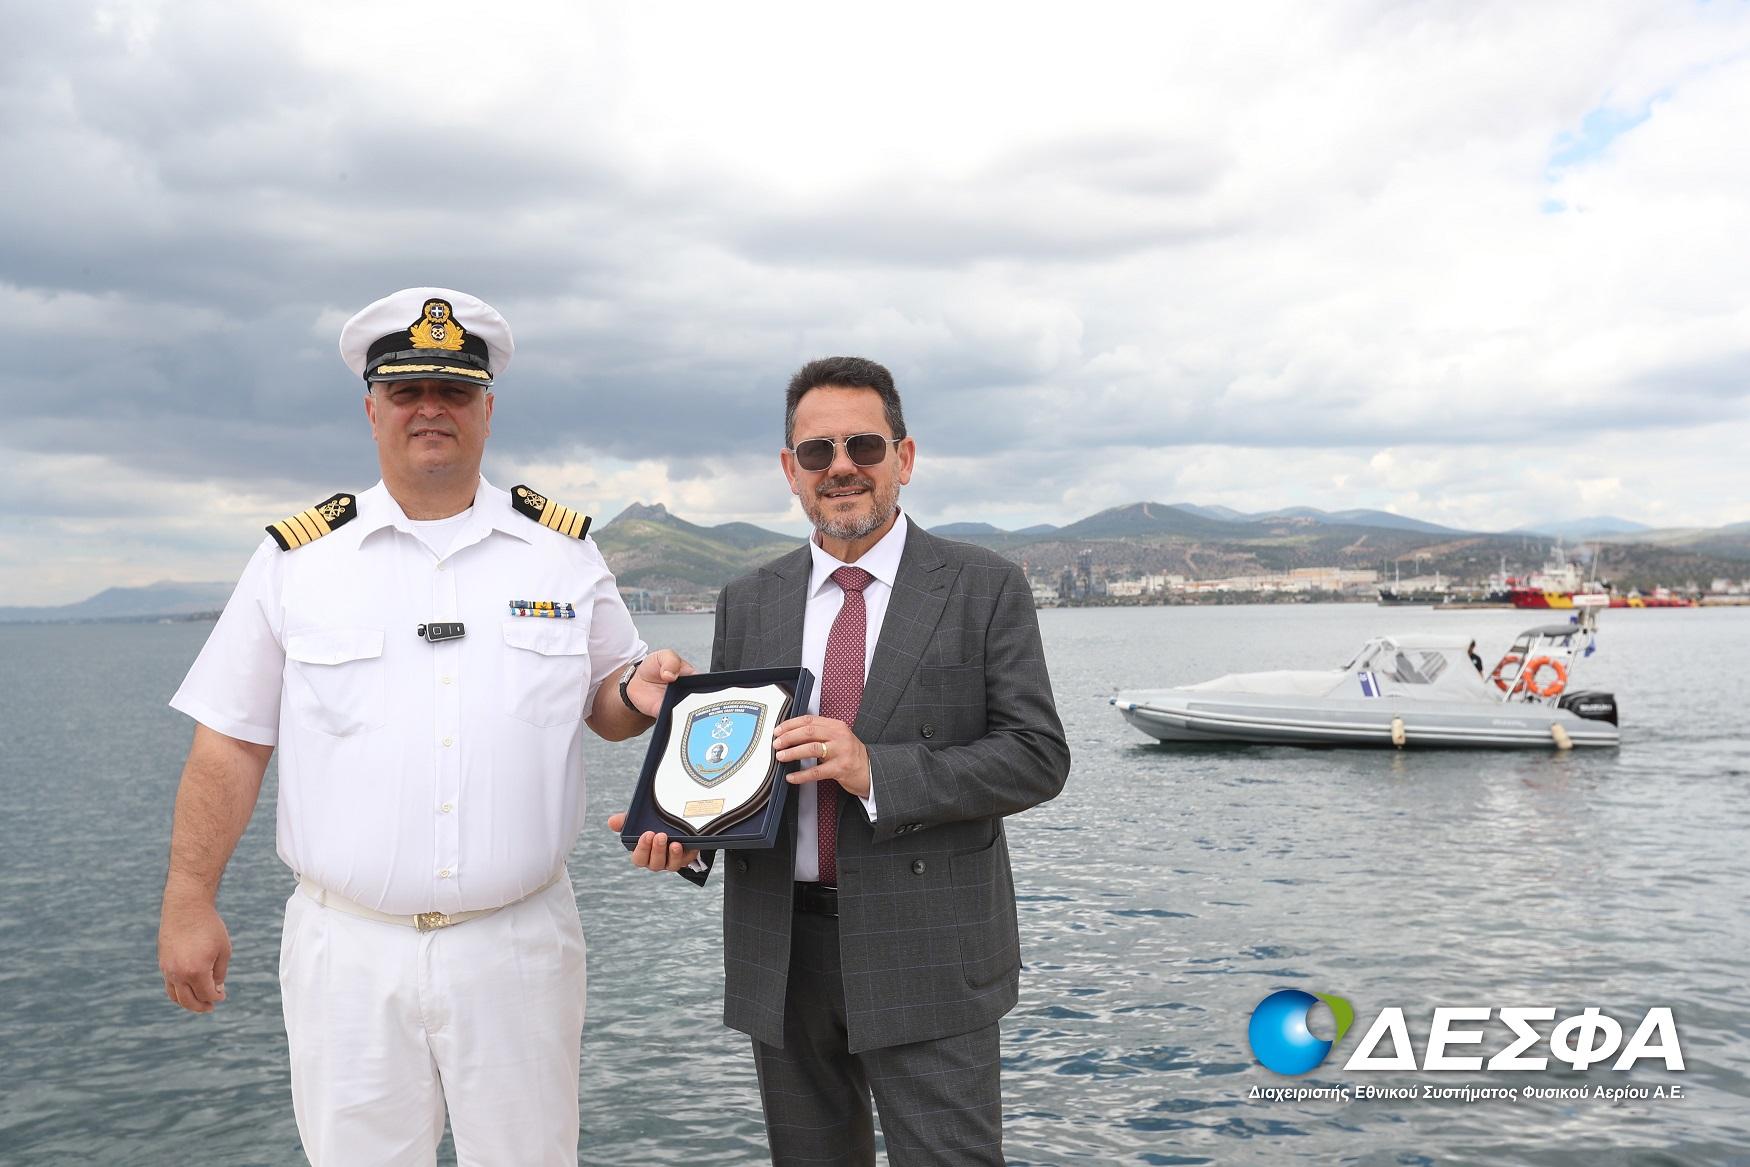 O ΔΕΣΦΑ συνεχίζει να υποστηρίζει το έργο του Κεντρικού Λιμεναρχείου Ελευσίνας